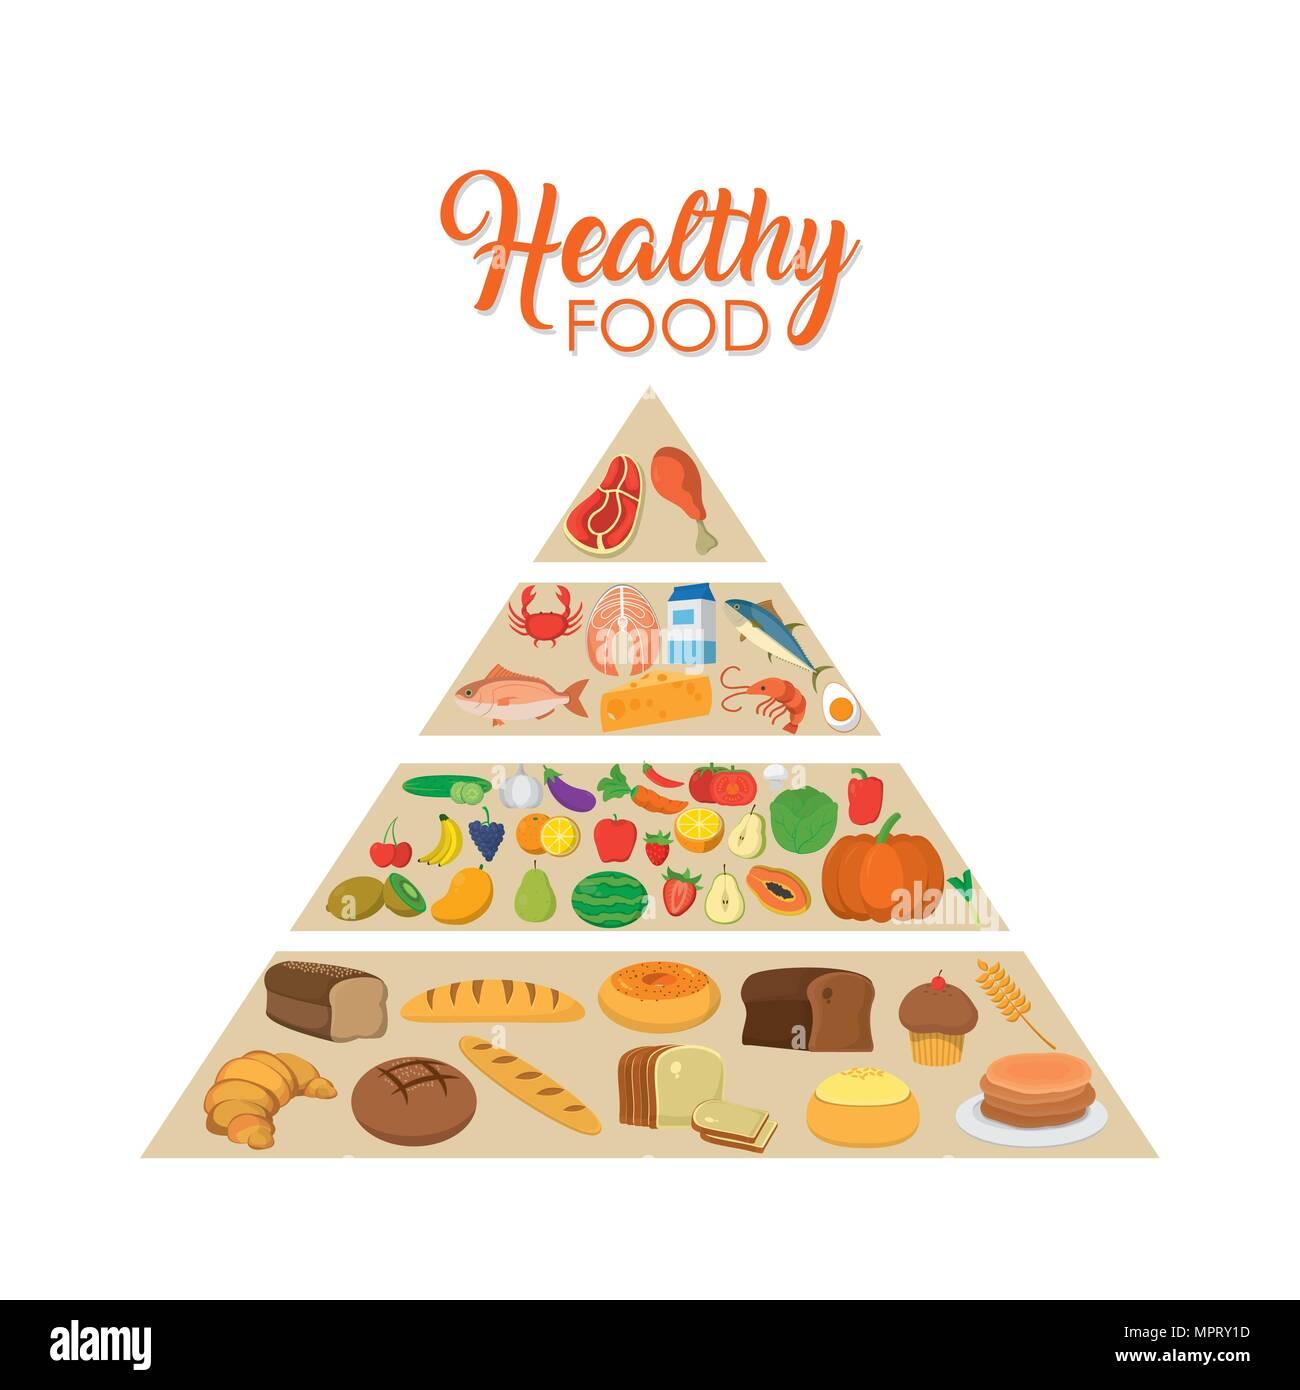 Healthy Food Pyramid Stock Vector Art Amp Illustration